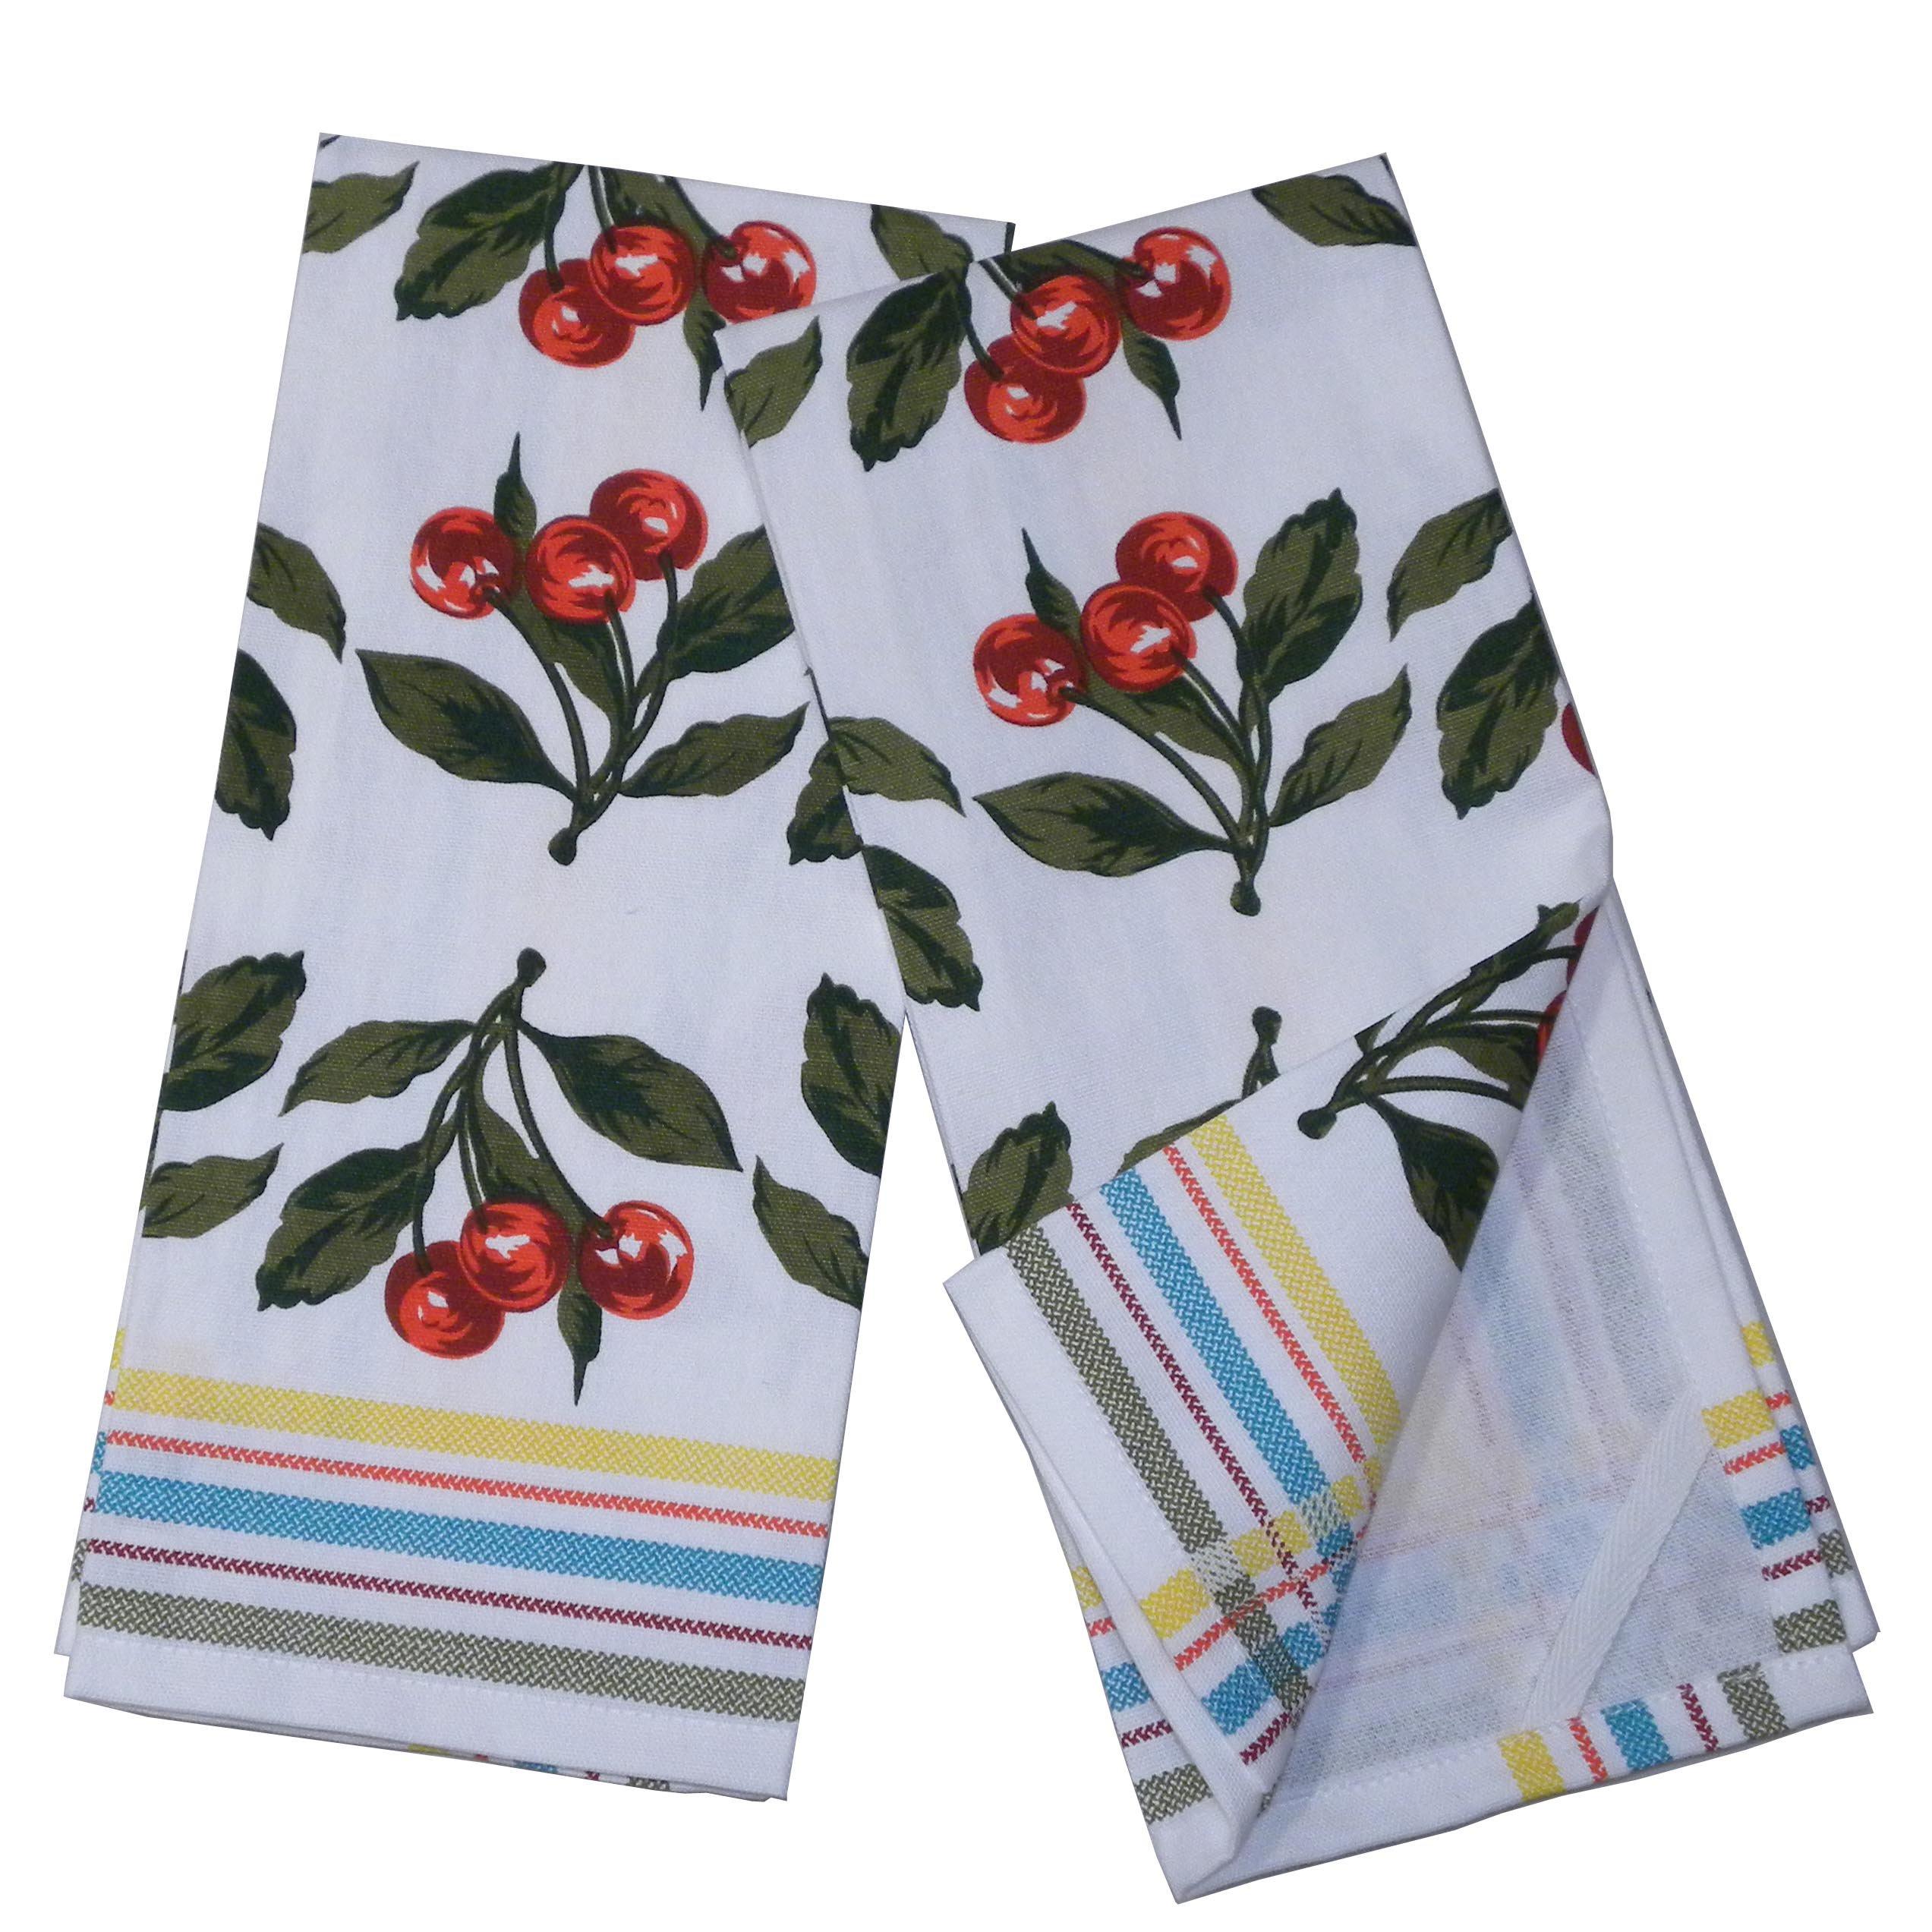 India Overseas Traders Cherries Dish Towels, set of 2